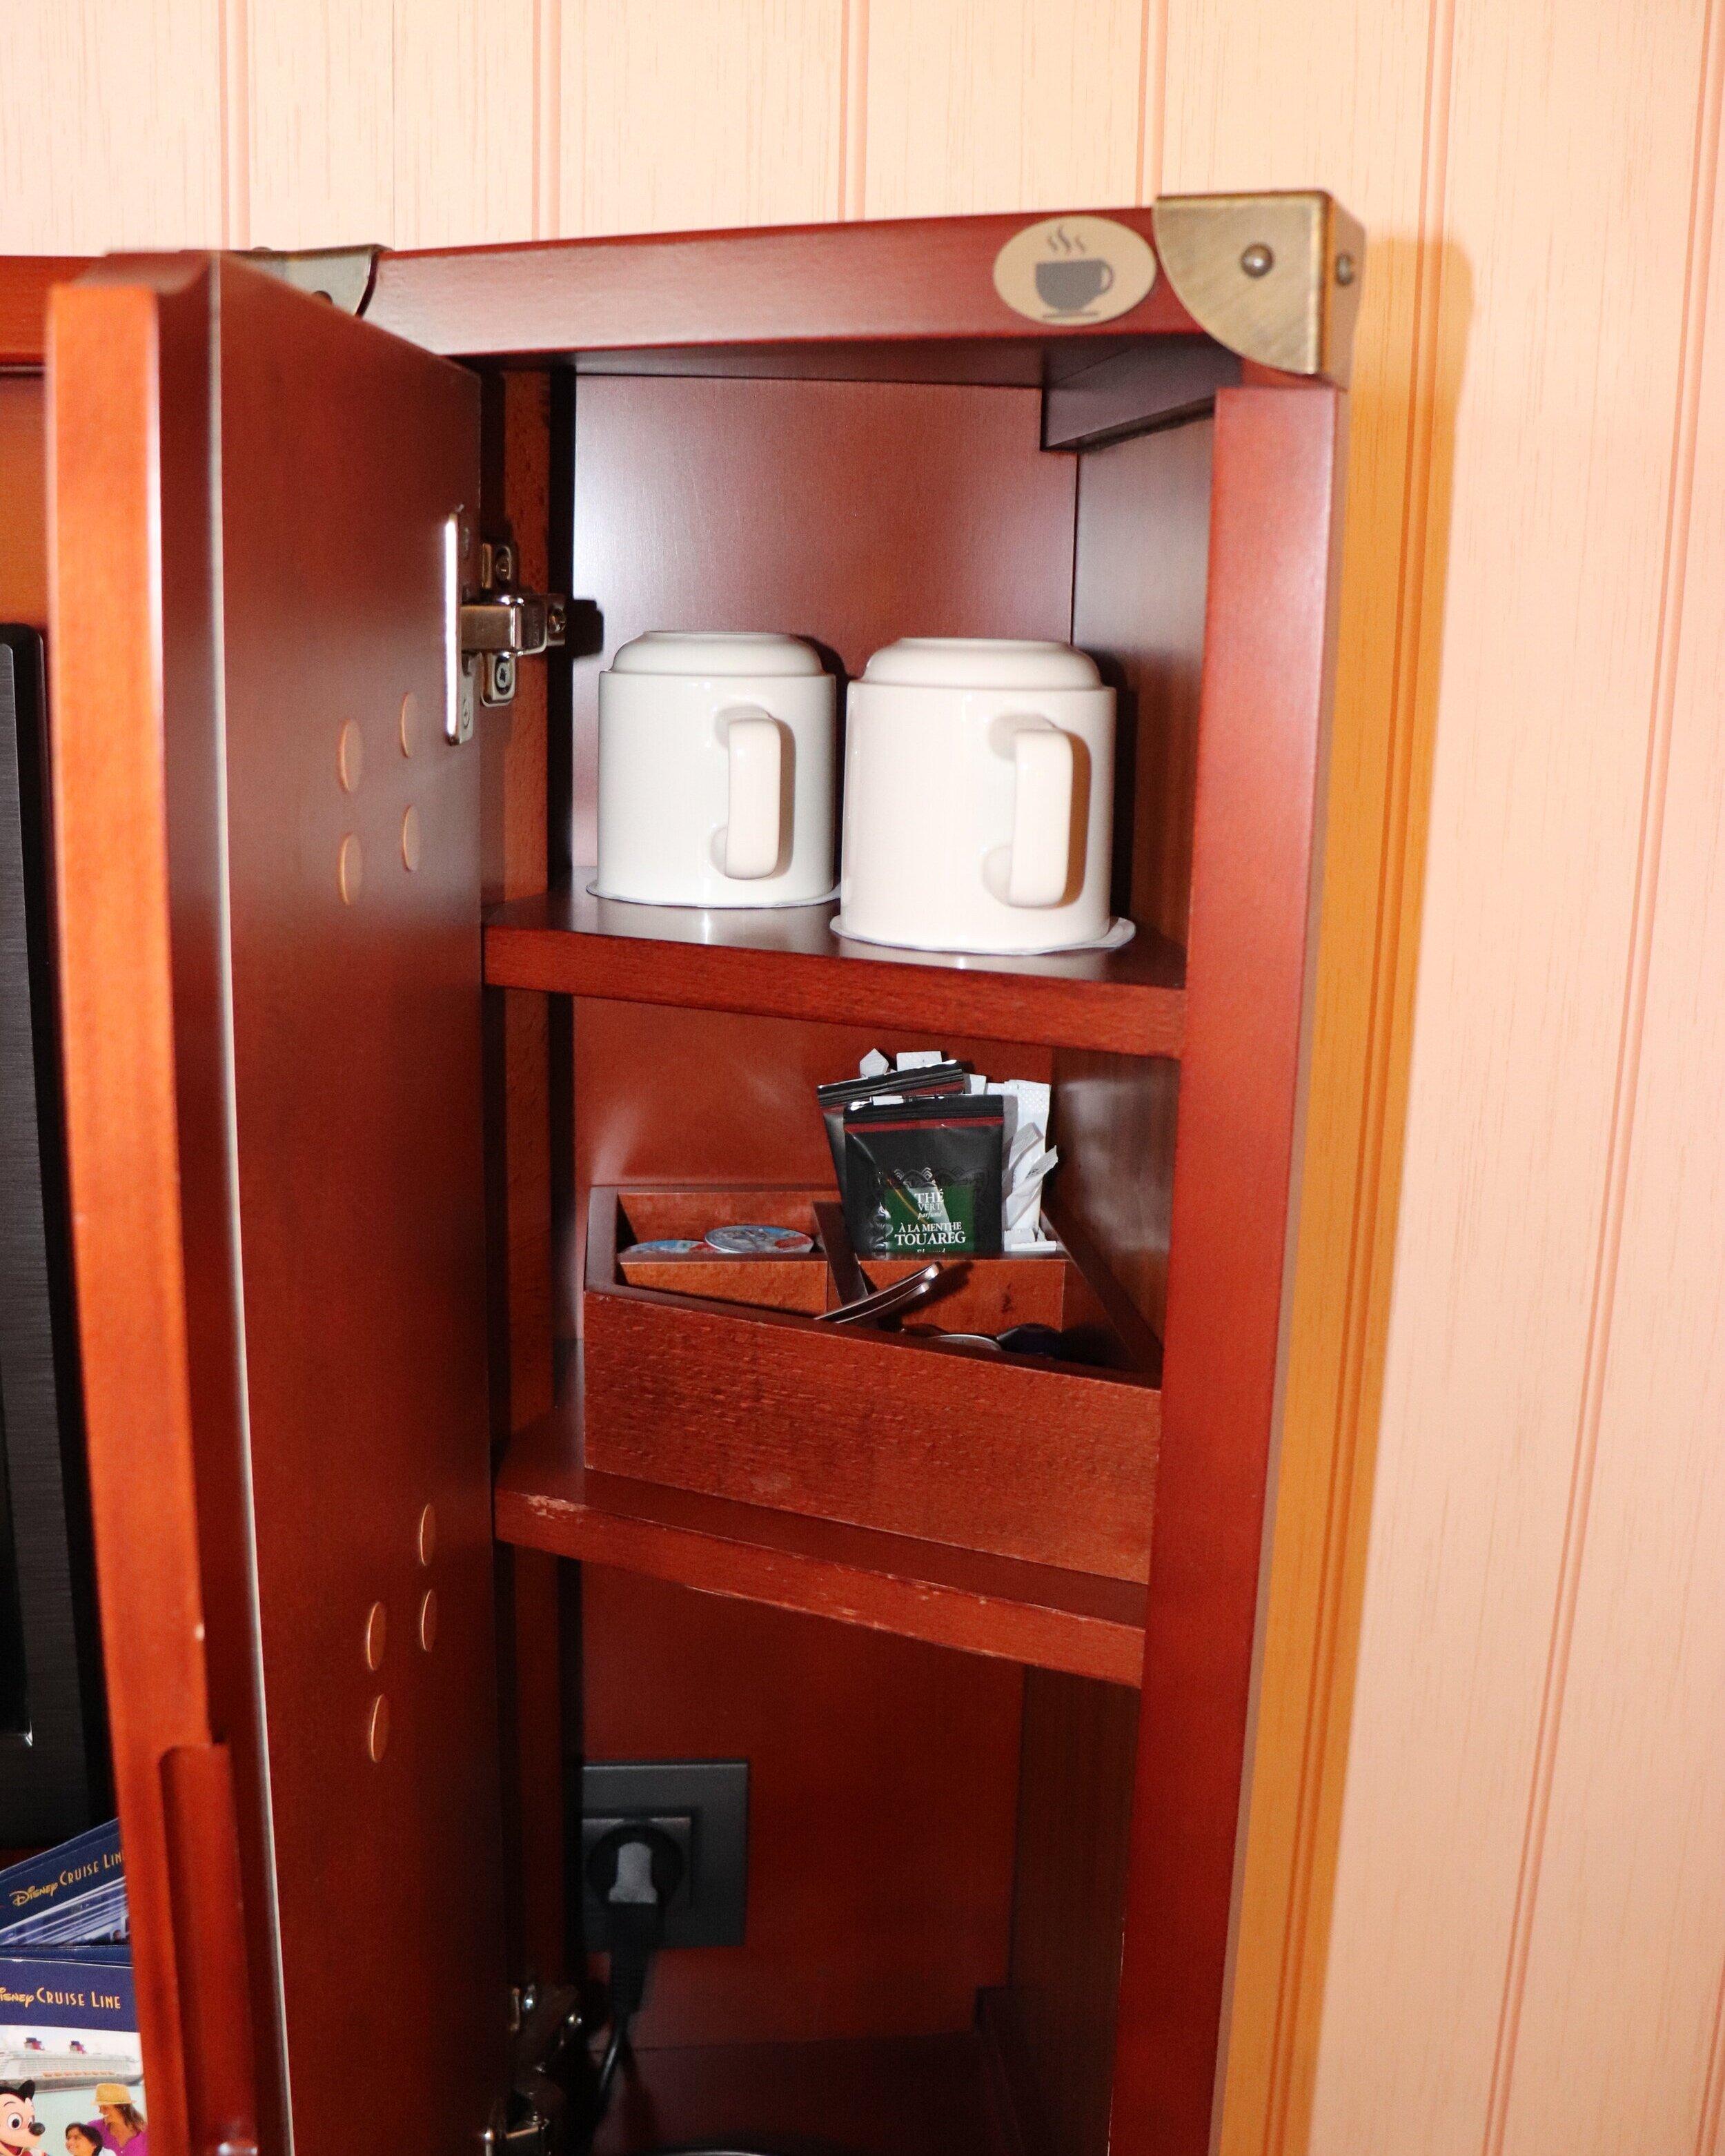 Tea supplies in the dresser.